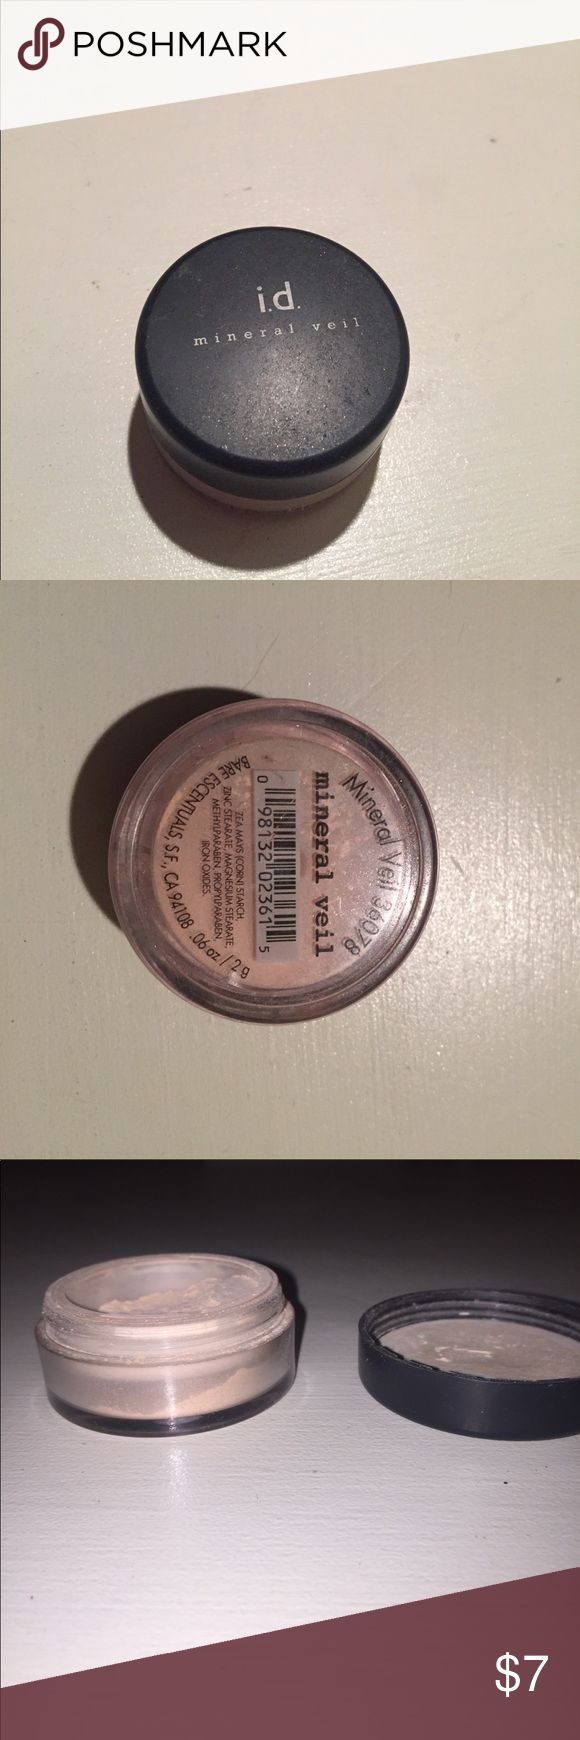 Bare Escentuals ID Mineral Veil Bare Escentuals Mineral Veil 36078. Used several times, but still in great condition. Bare Escentuals Makeup Face Powder